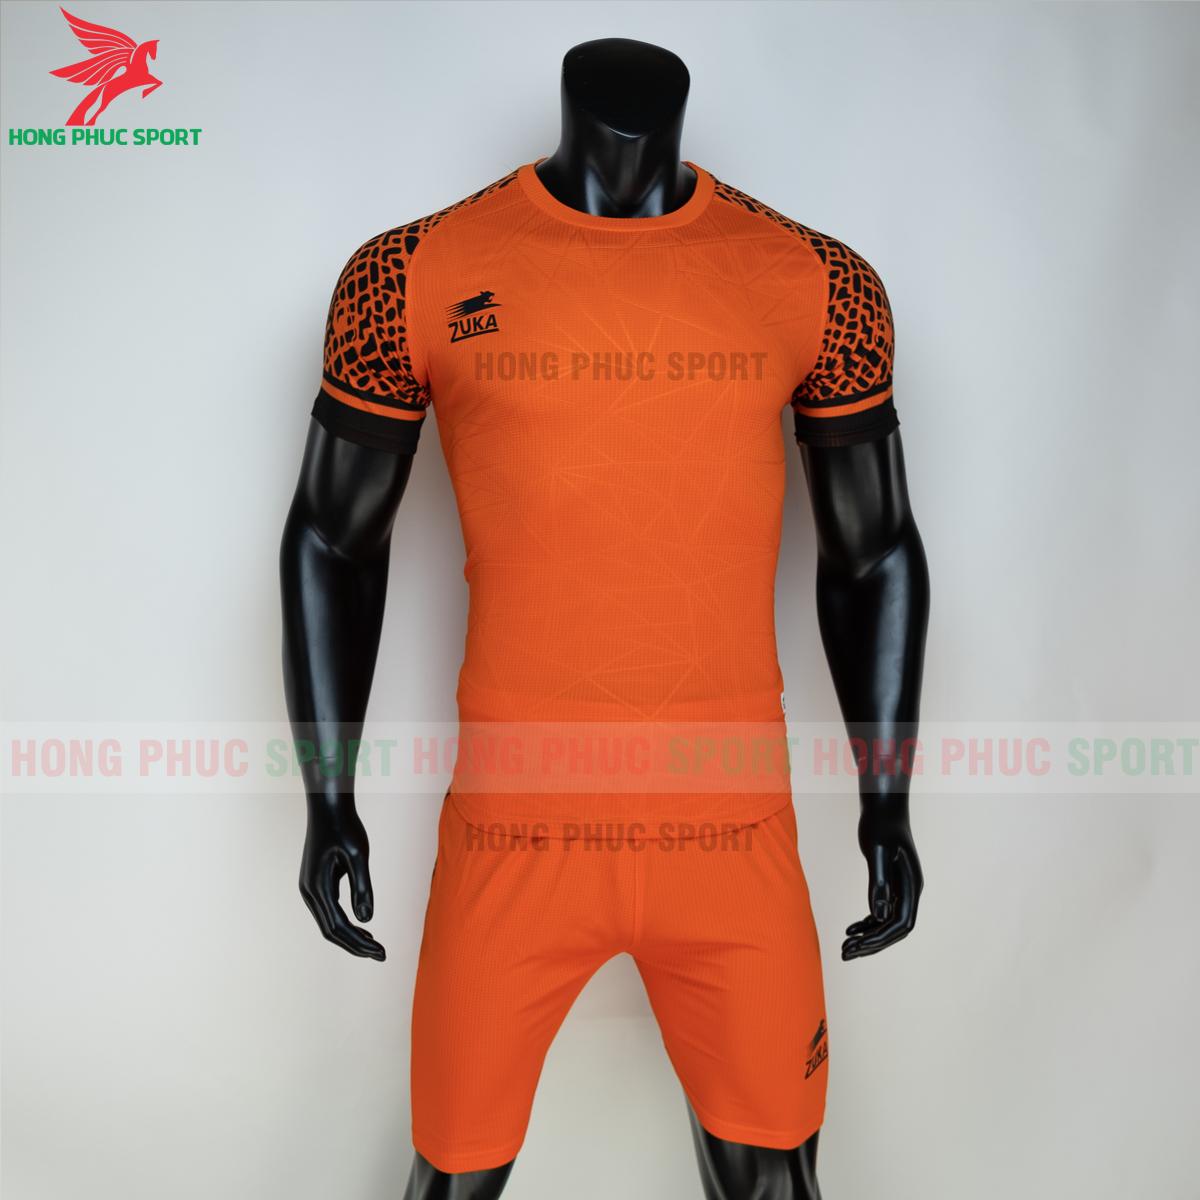 https://cdn.hongphucsport.com/unsafe/s4.shopbay.vn/files/285/ao-bong-da-khong-logo-zuka-02-mau-cam-60502f72c5d73.png